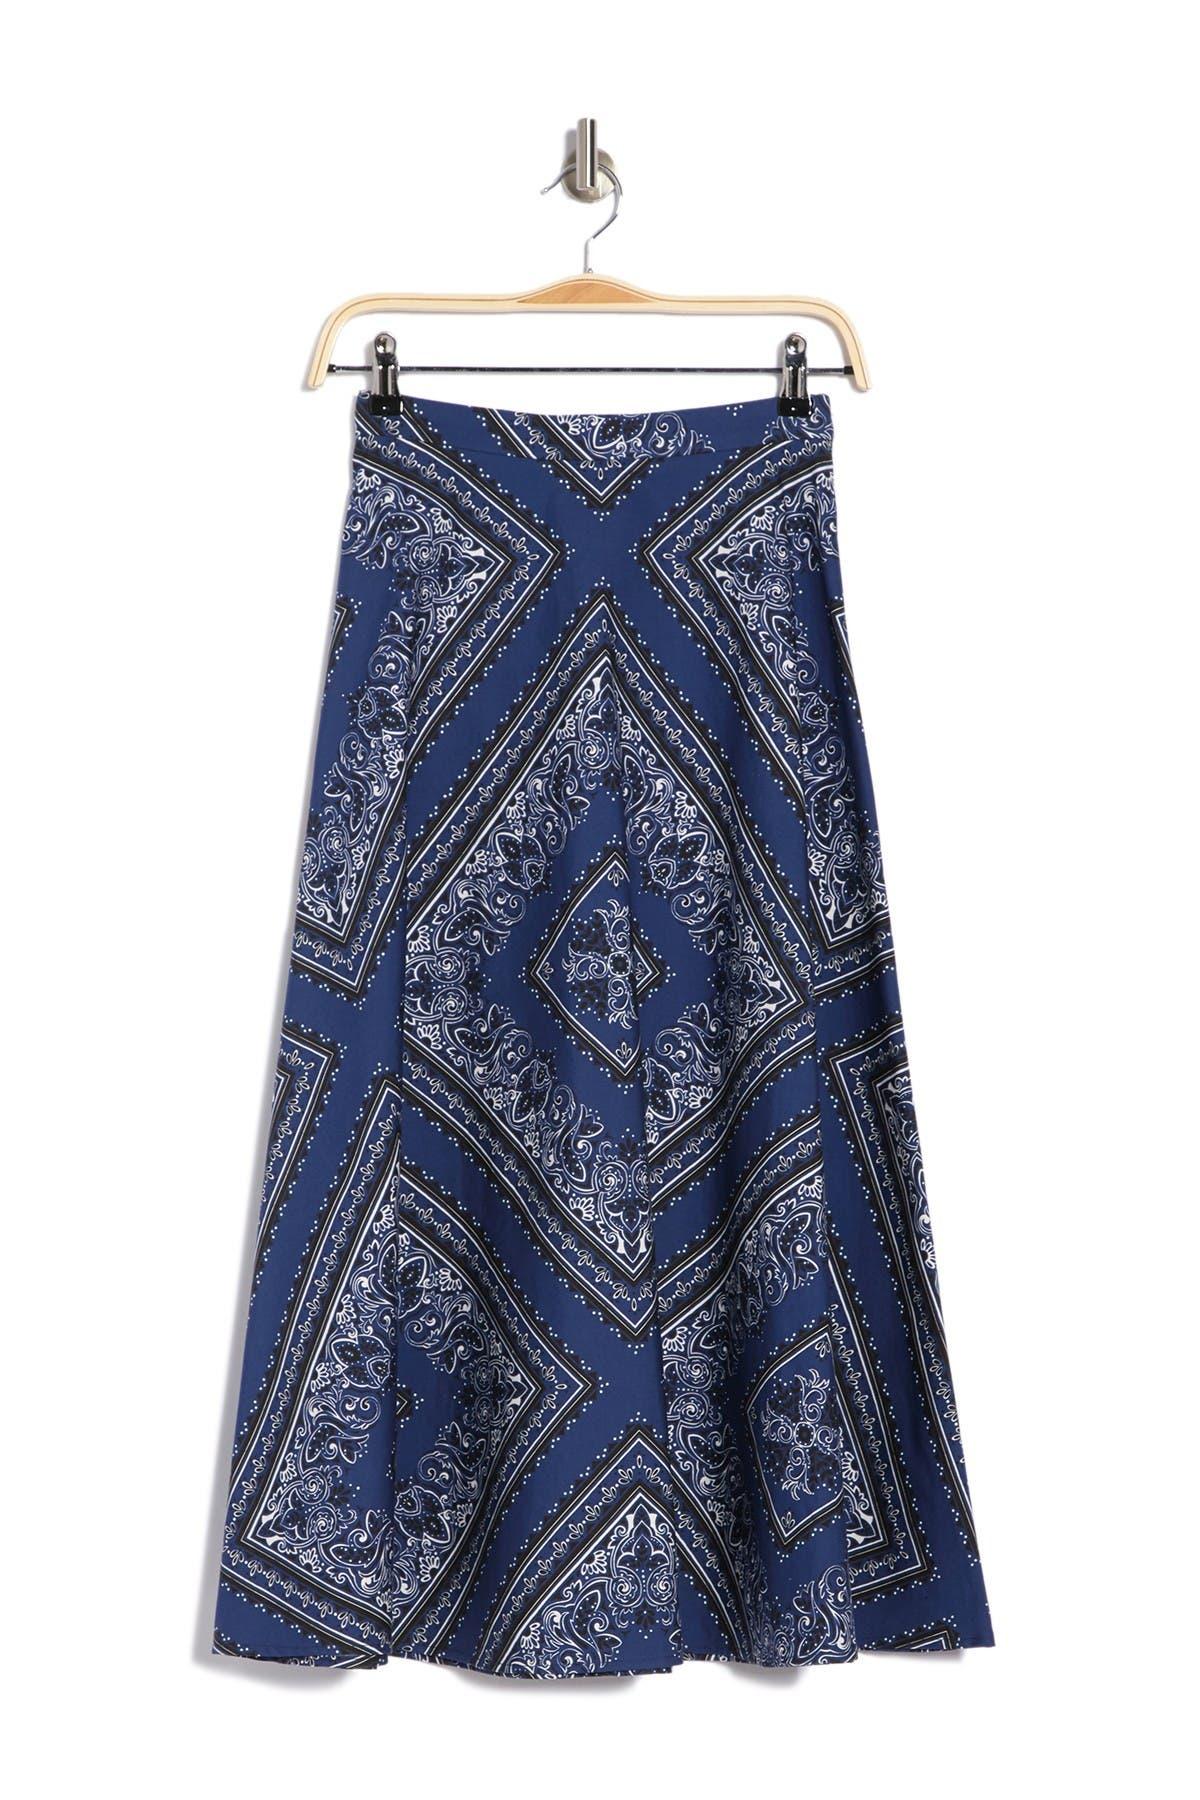 Image of RED Valentino Hankie Print Skirt